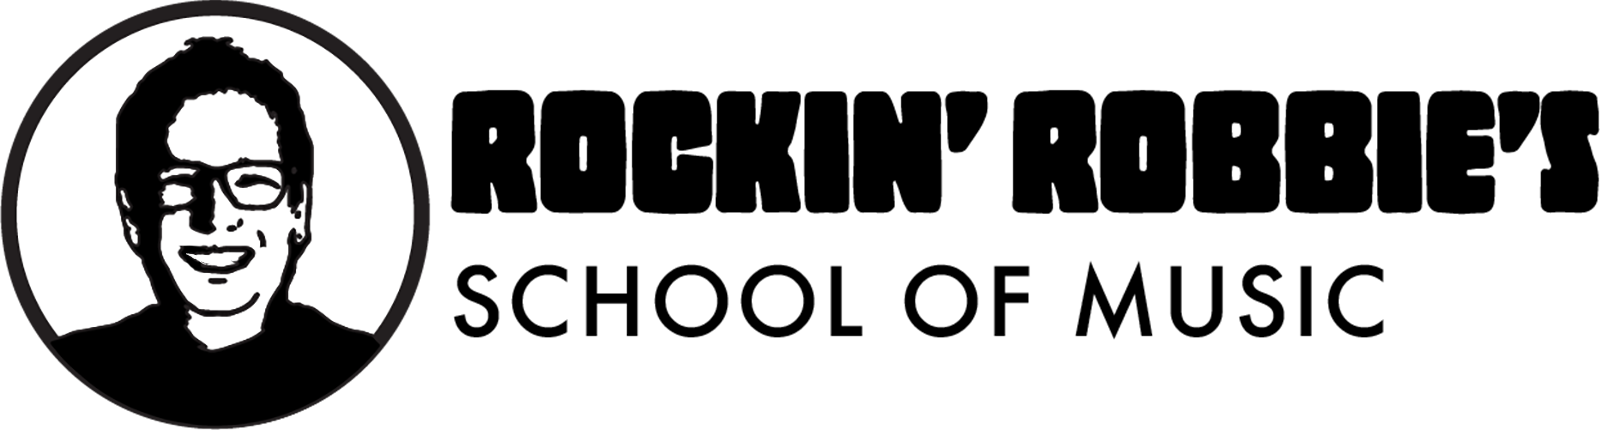 School of Music LogoLONG-2.png